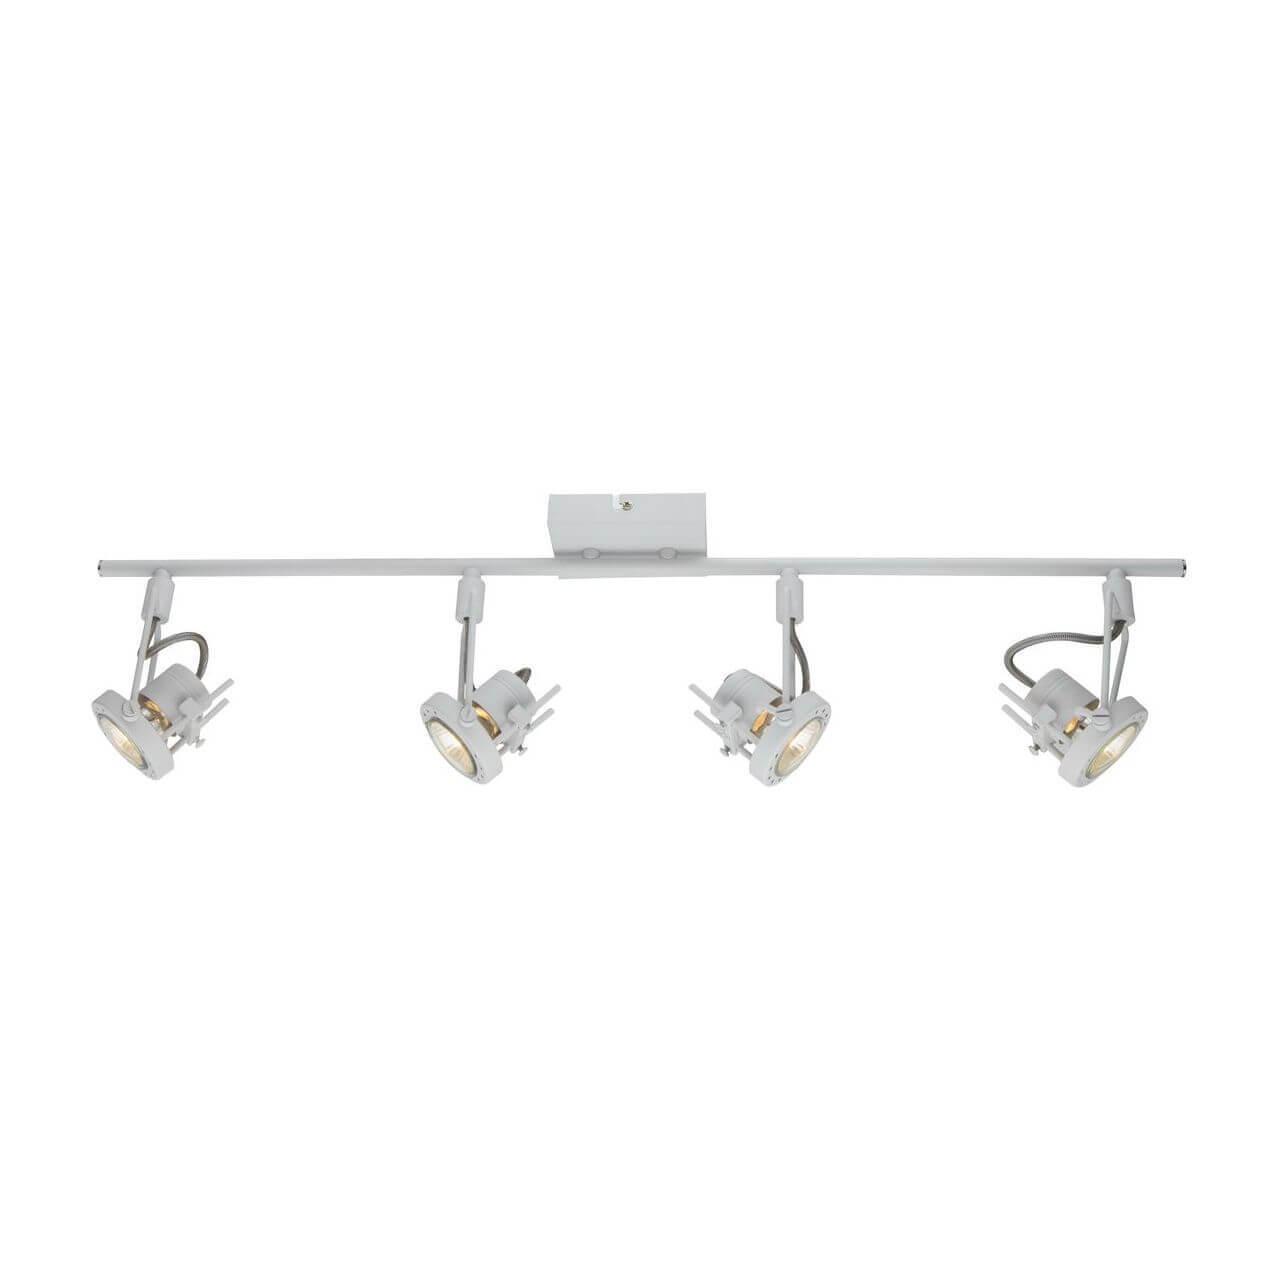 Спот Arte Lamp A4301PL-4WH 4301 недорого